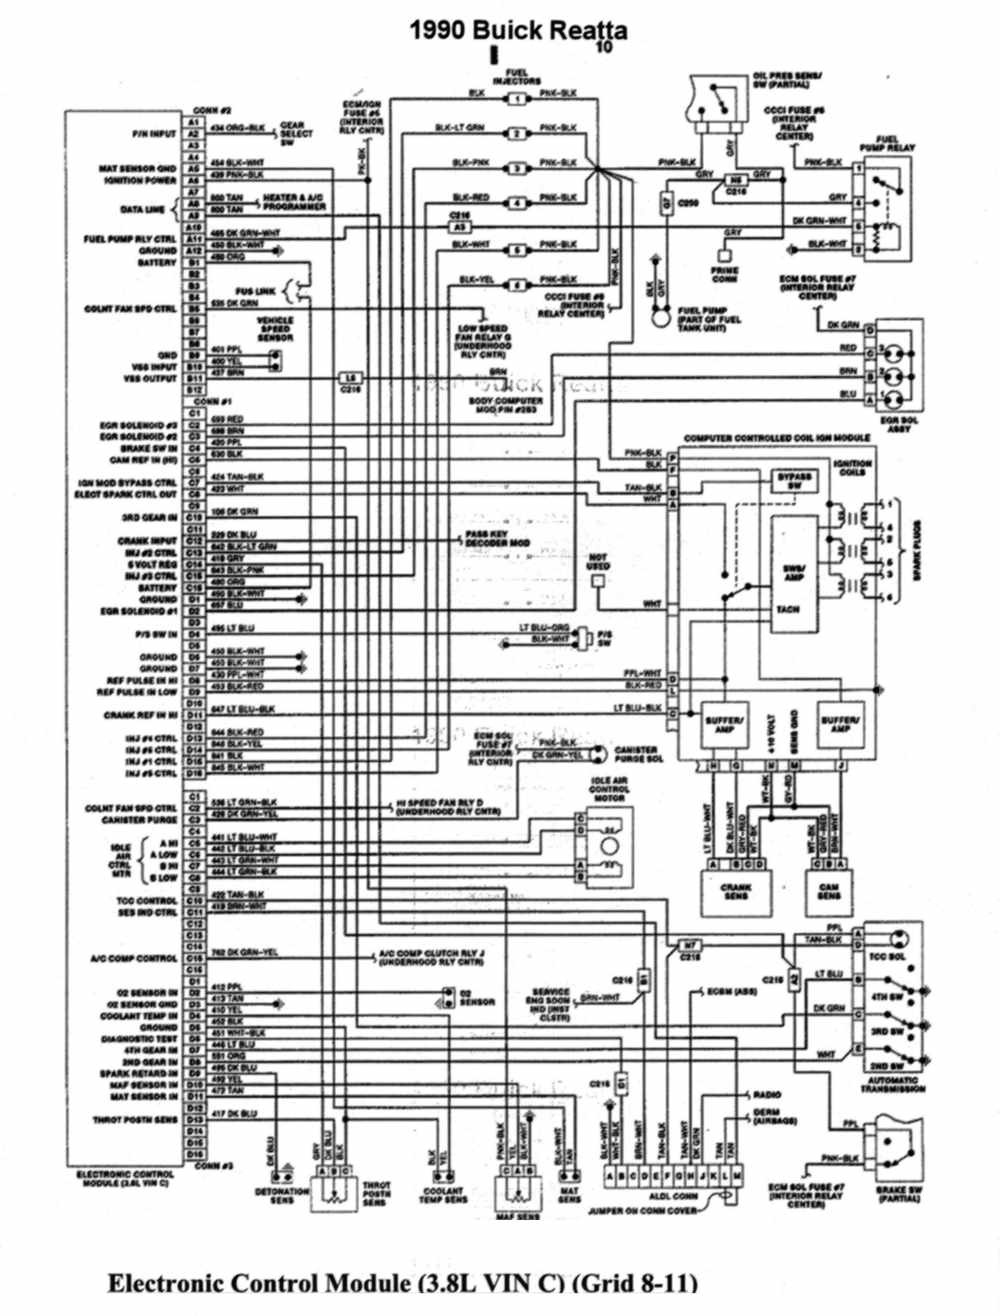 1998 Buick Regal Radio Wiring Diagram Page 5 And 1978 Riviera Diagrams Automotive U2022 Rh Nfluencer Co 1996 Century